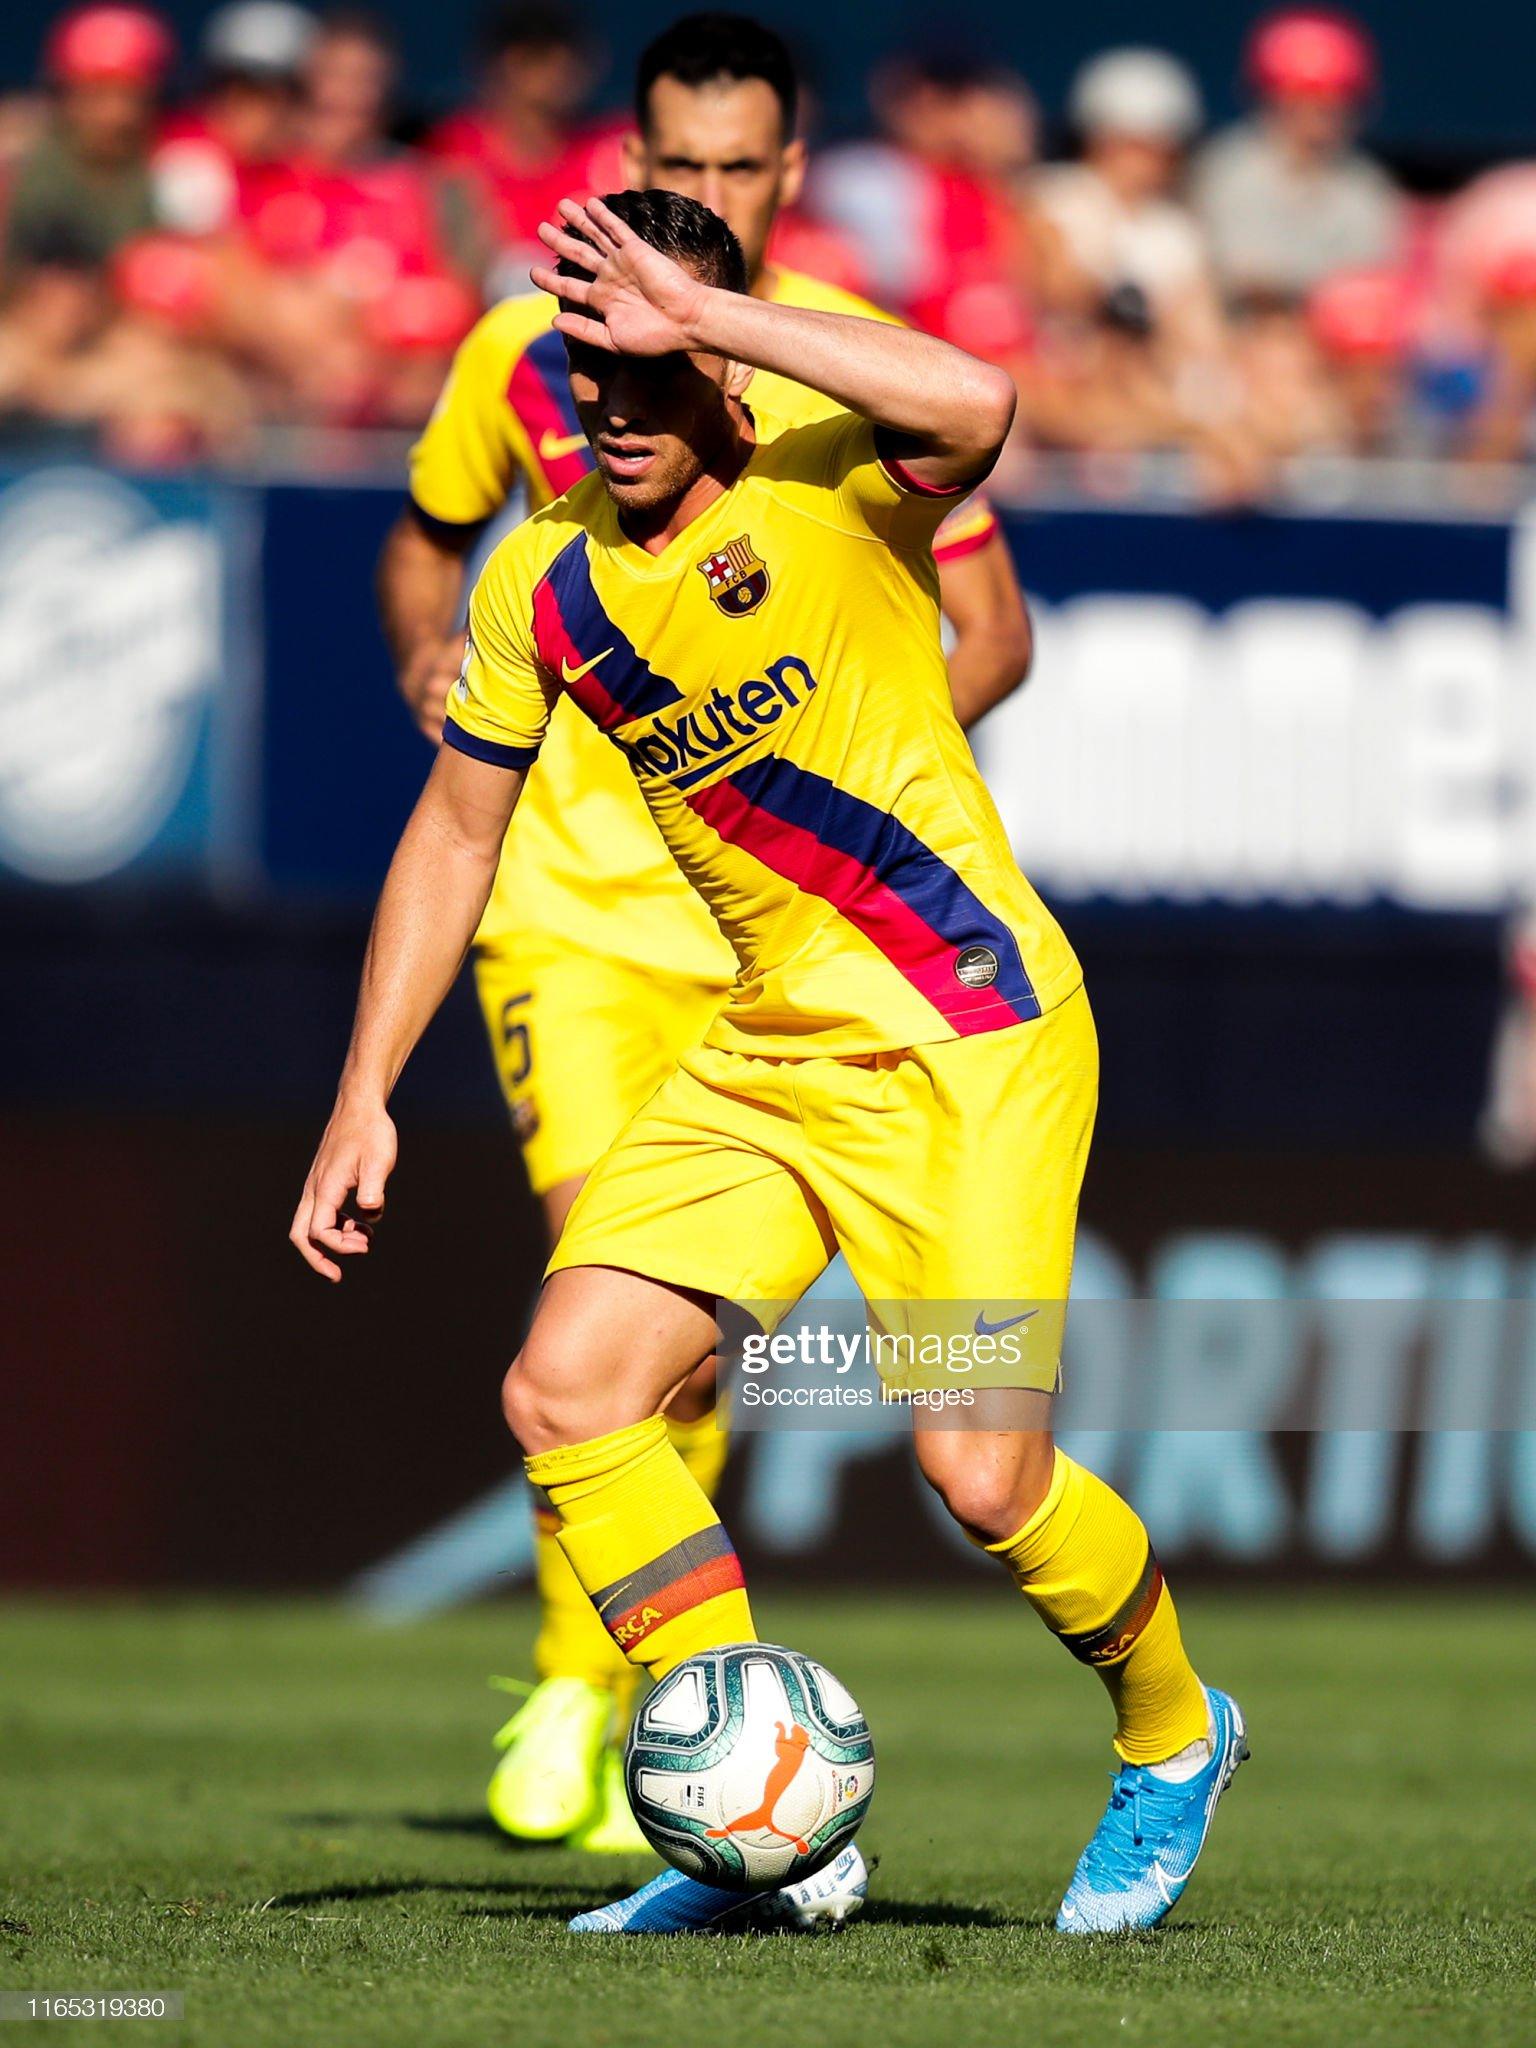 صور مباراة : أوساسونا - برشلونة 2-2 ( 31-08-2019 )  Arthur-of-fc-barcelona-during-the-la-liga-santander-match-between-v-picture-id1165319380?s=2048x2048